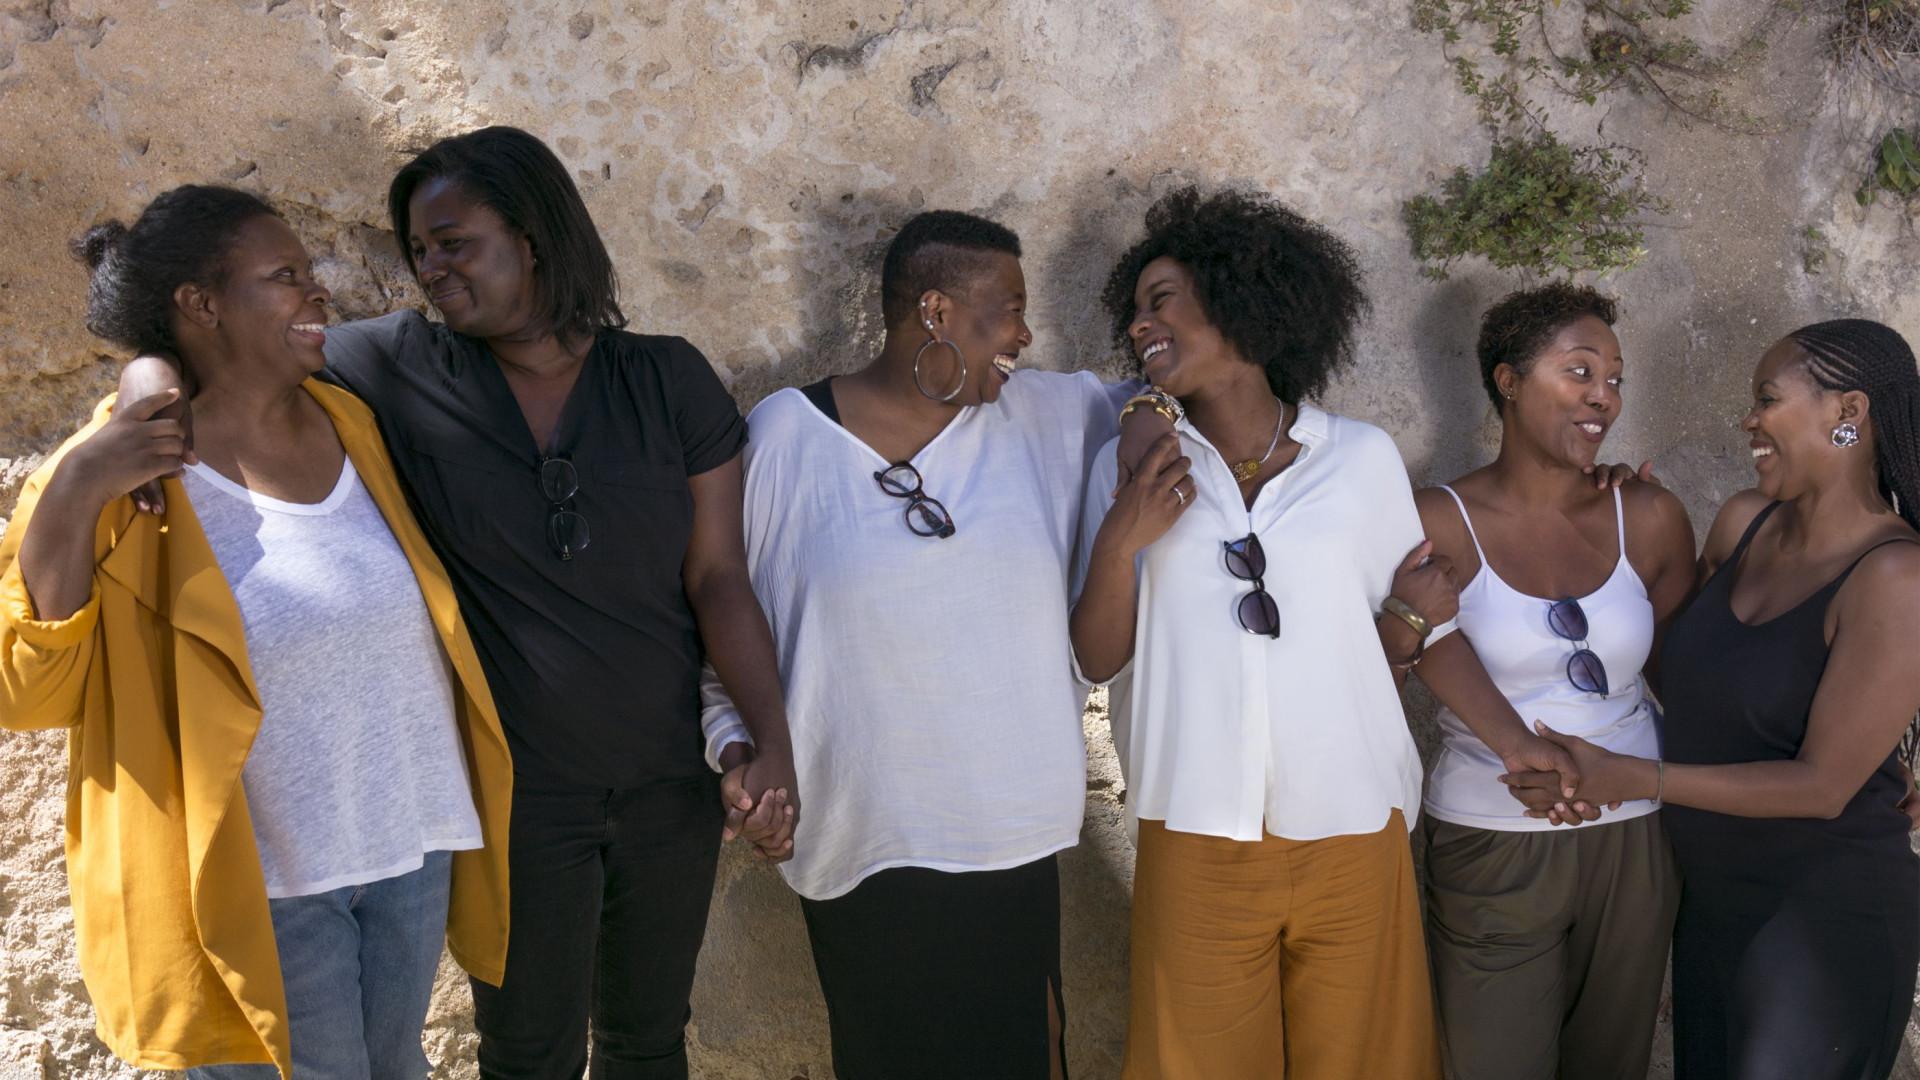 Feminista e antirracista. O INMUNE vem dar voz à mulher negra portuguesa